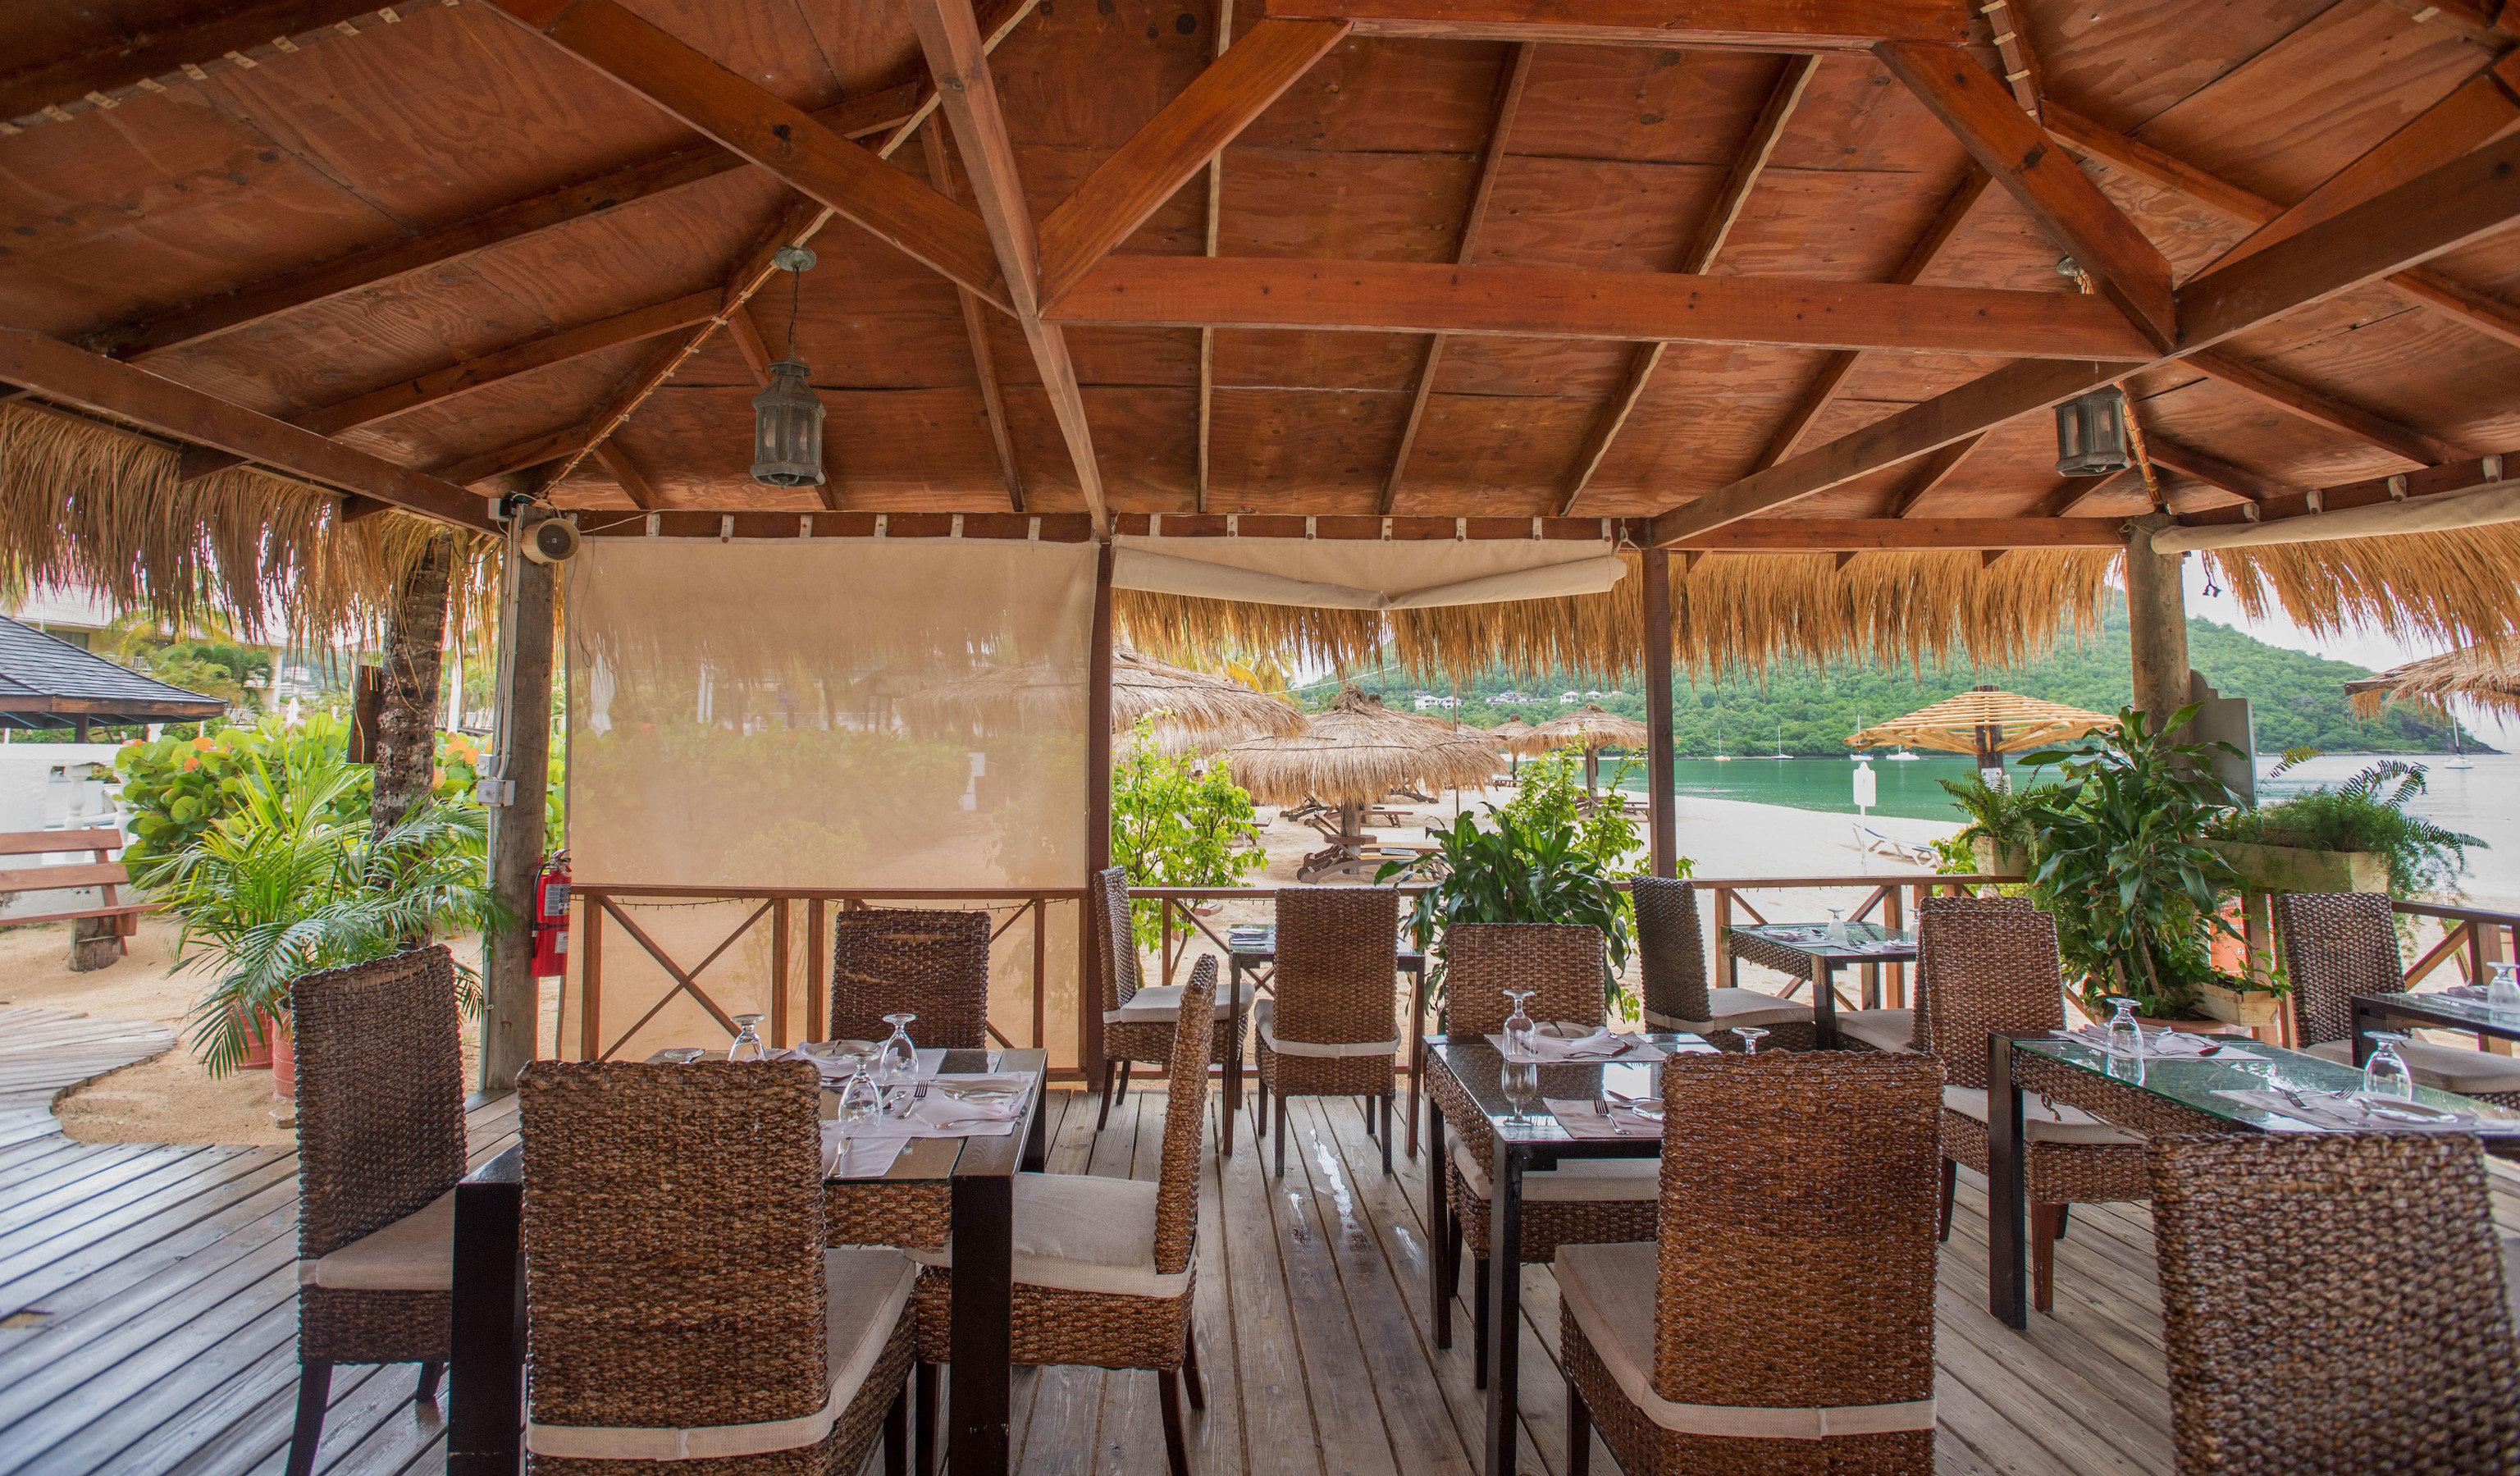 chair property Resort restaurant cottage outdoor structure Villa eco hotel backyard Dining hacienda